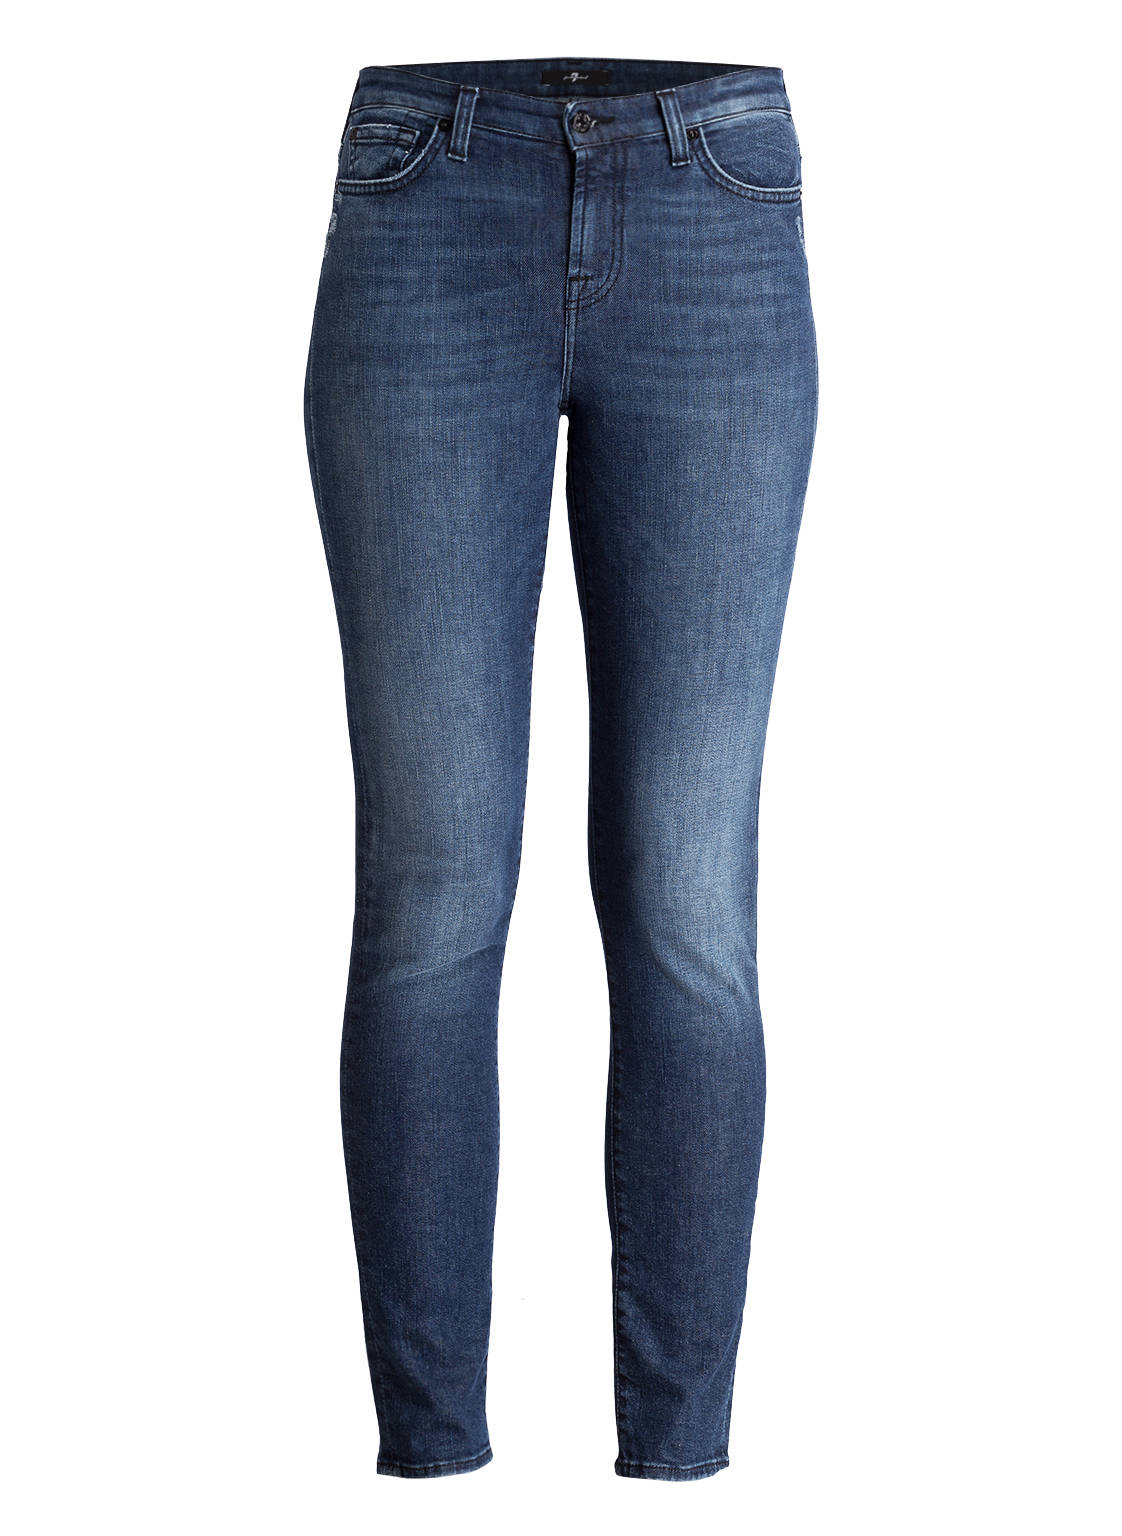 7 for all mankind Skinny-Jeans PYPER